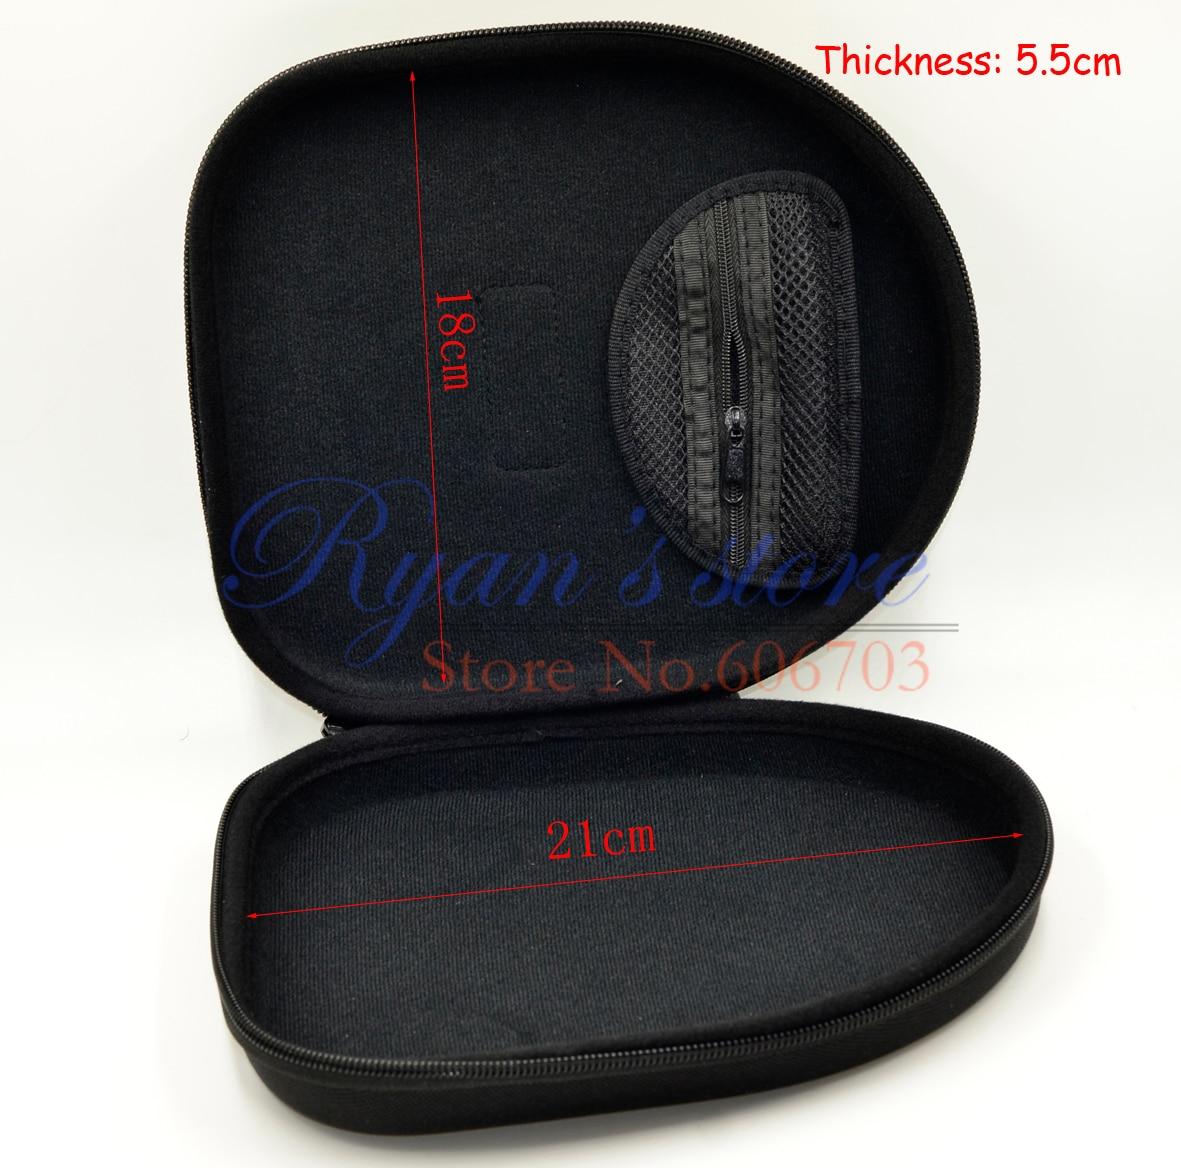 bilder für Hard Case Box Bag Für SONY MDR XB900 XB910 XB920 XB 950AP 950BT Kopfhörer